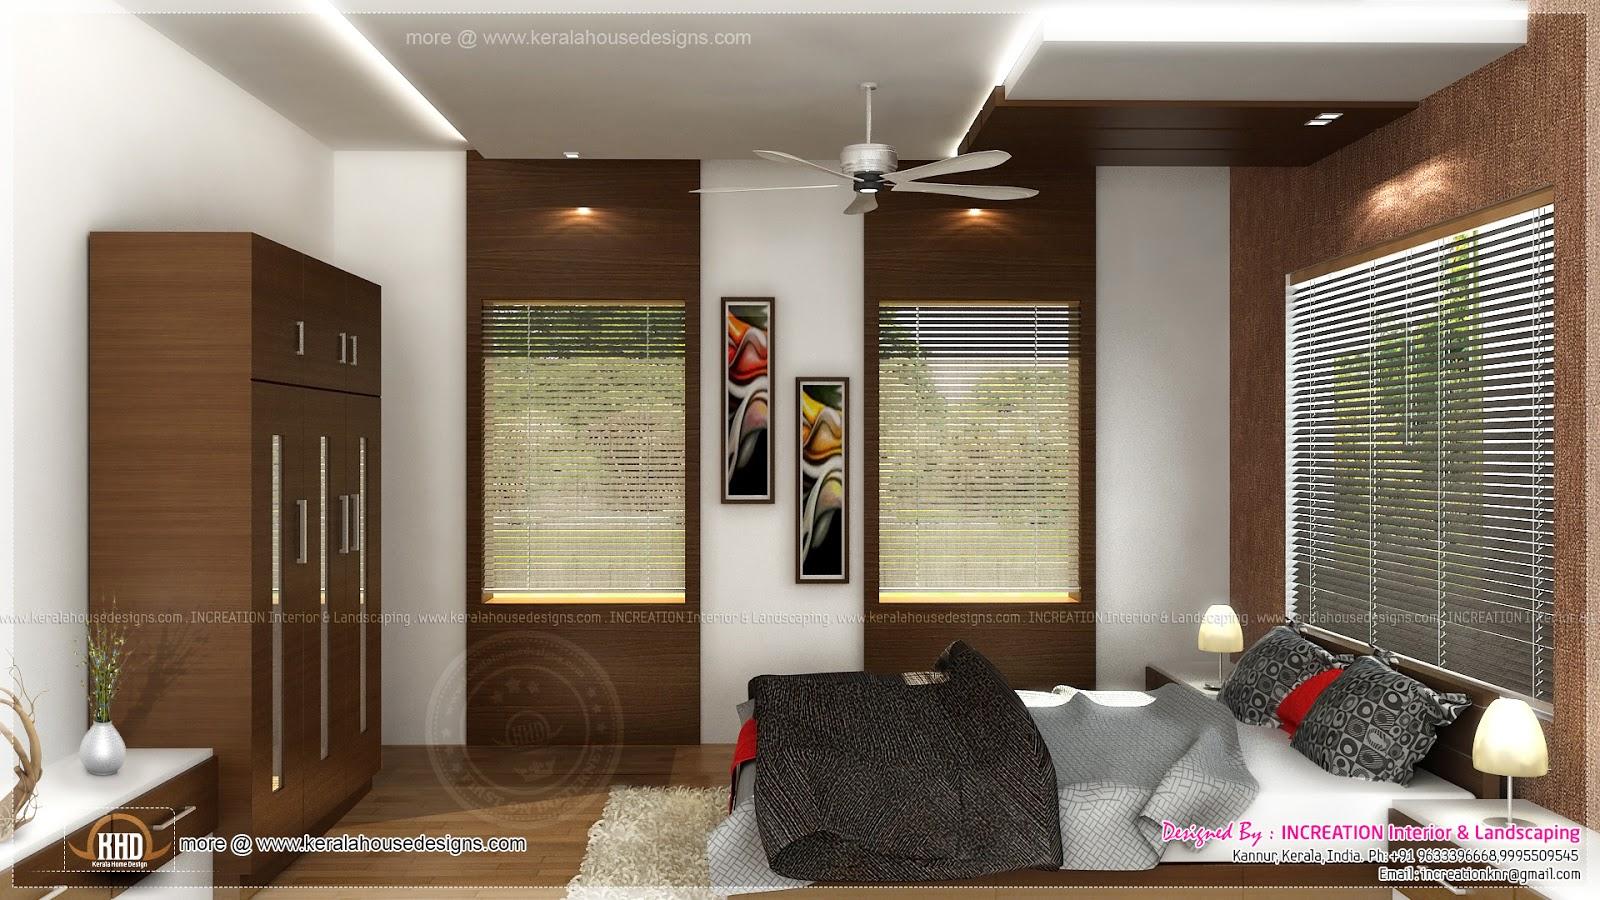 Interior designs from Kannur, Kerala | Home Kerala Plans